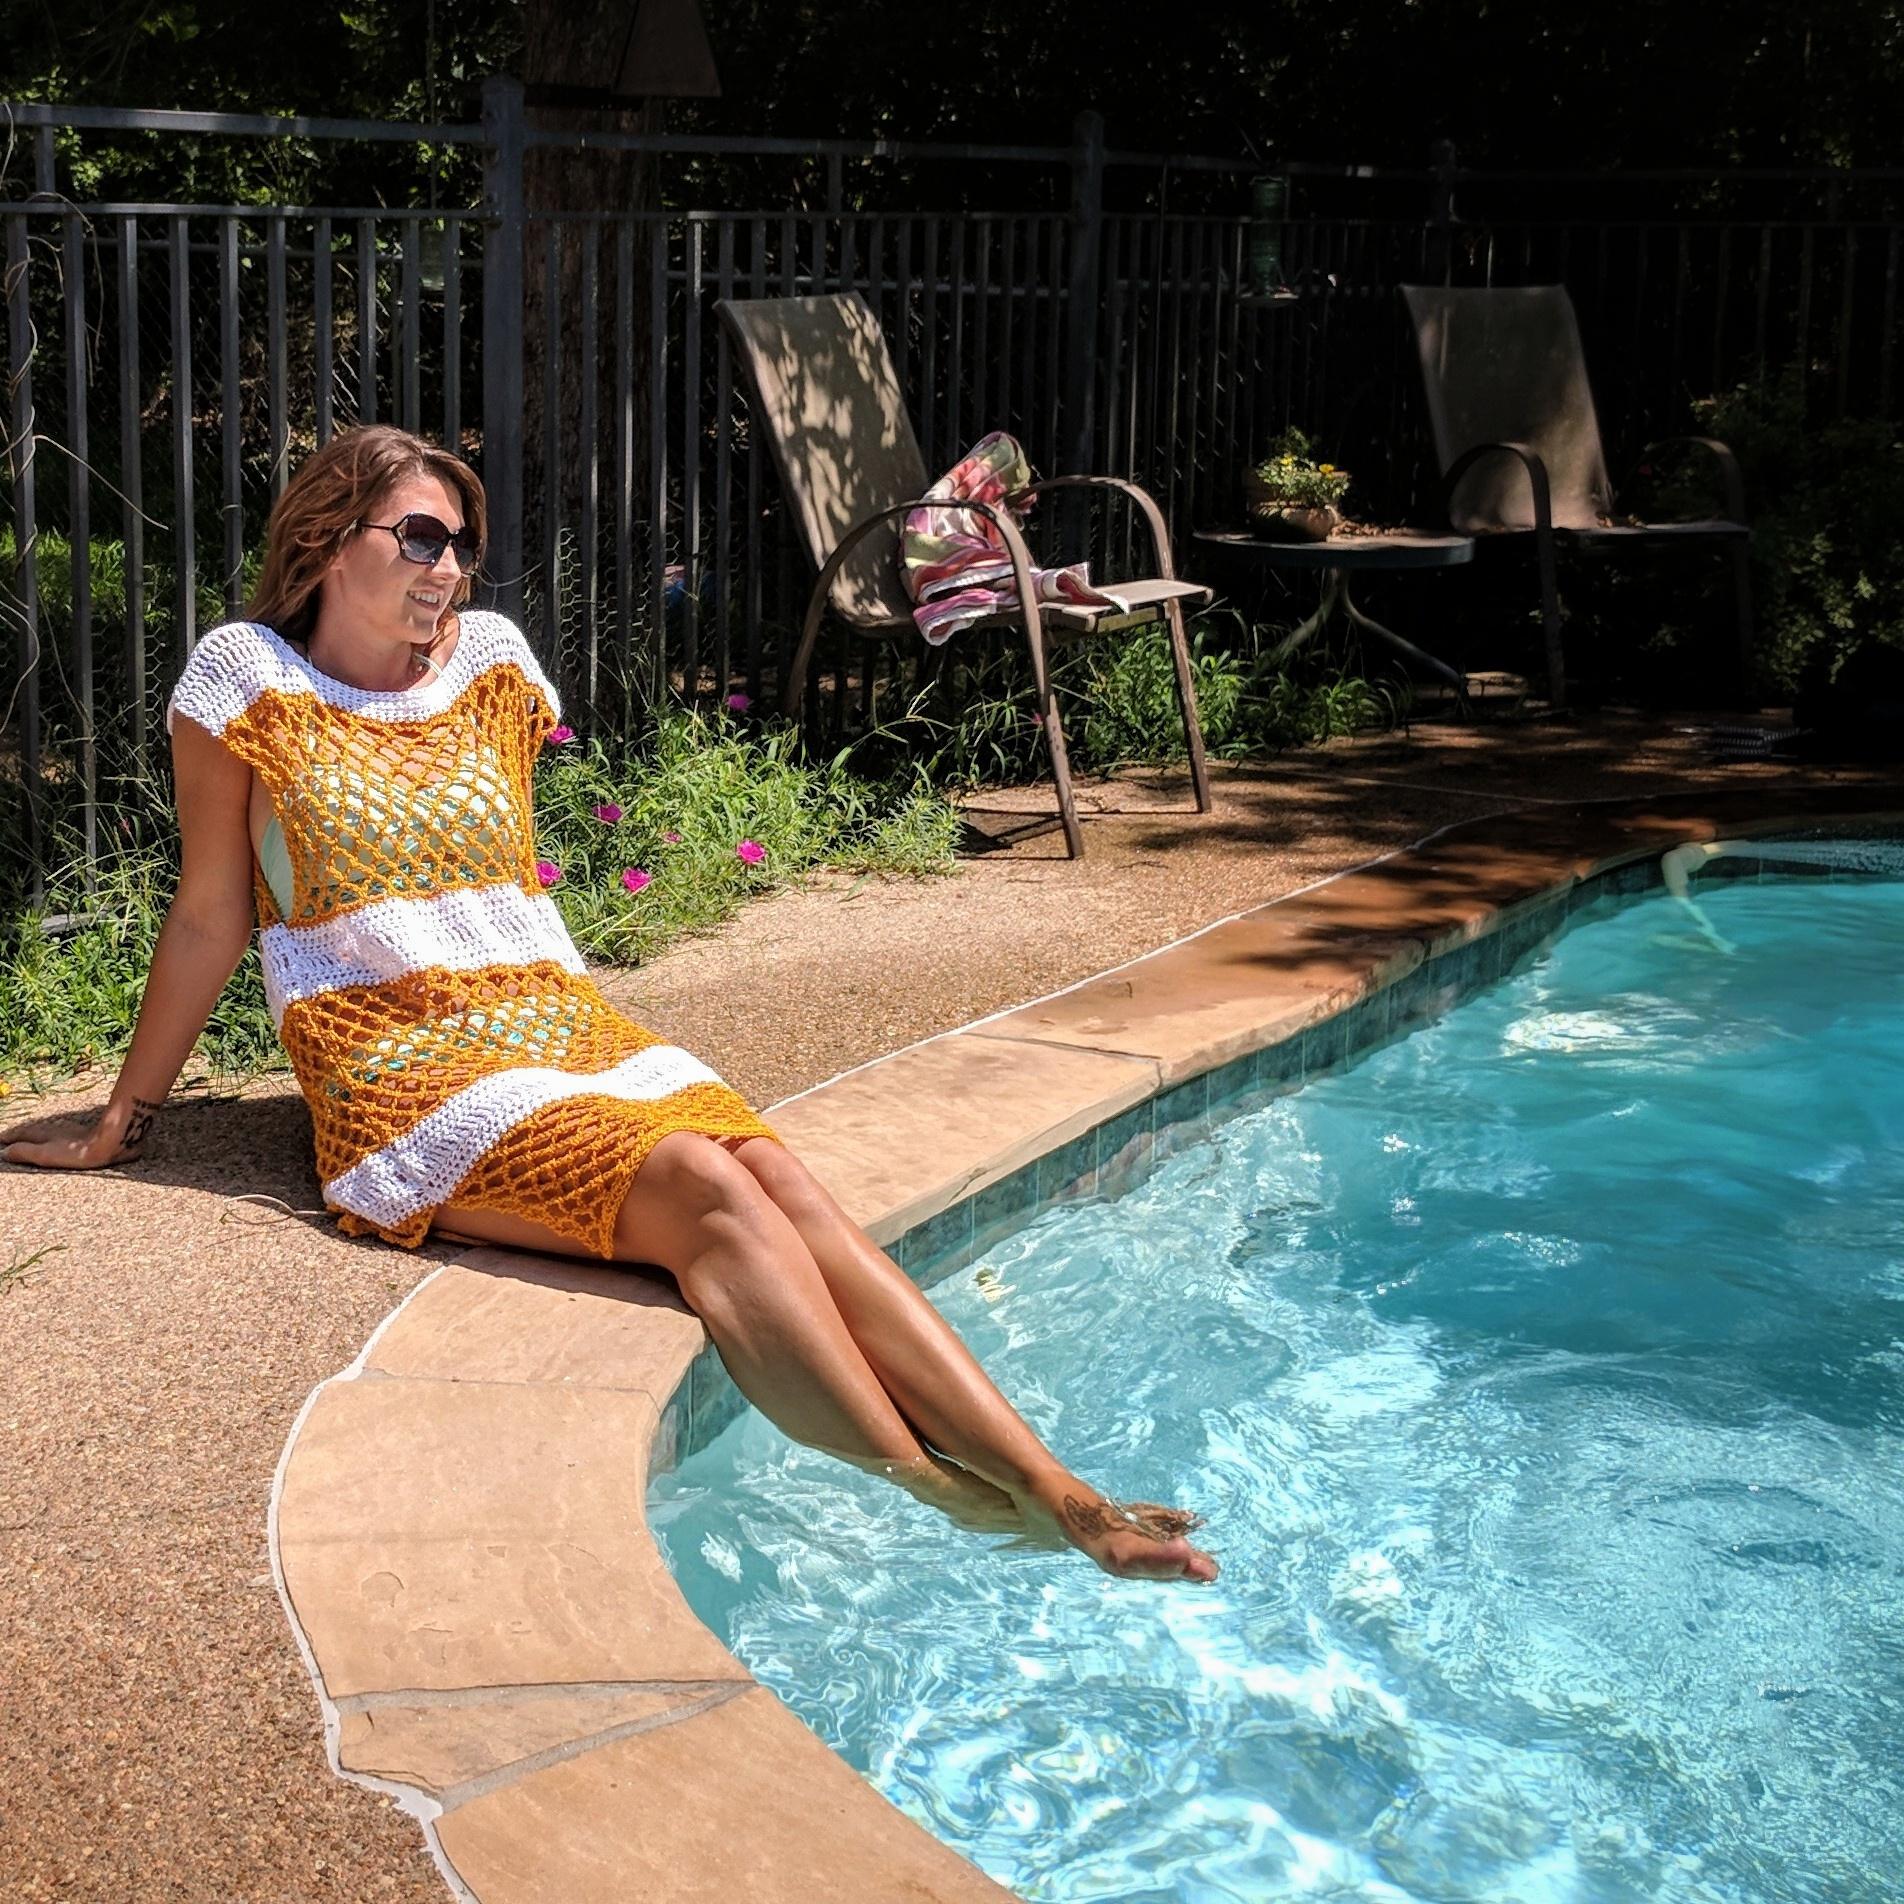 Sanibel_Pool-Dress_free-crochet-pattern55.jpeg